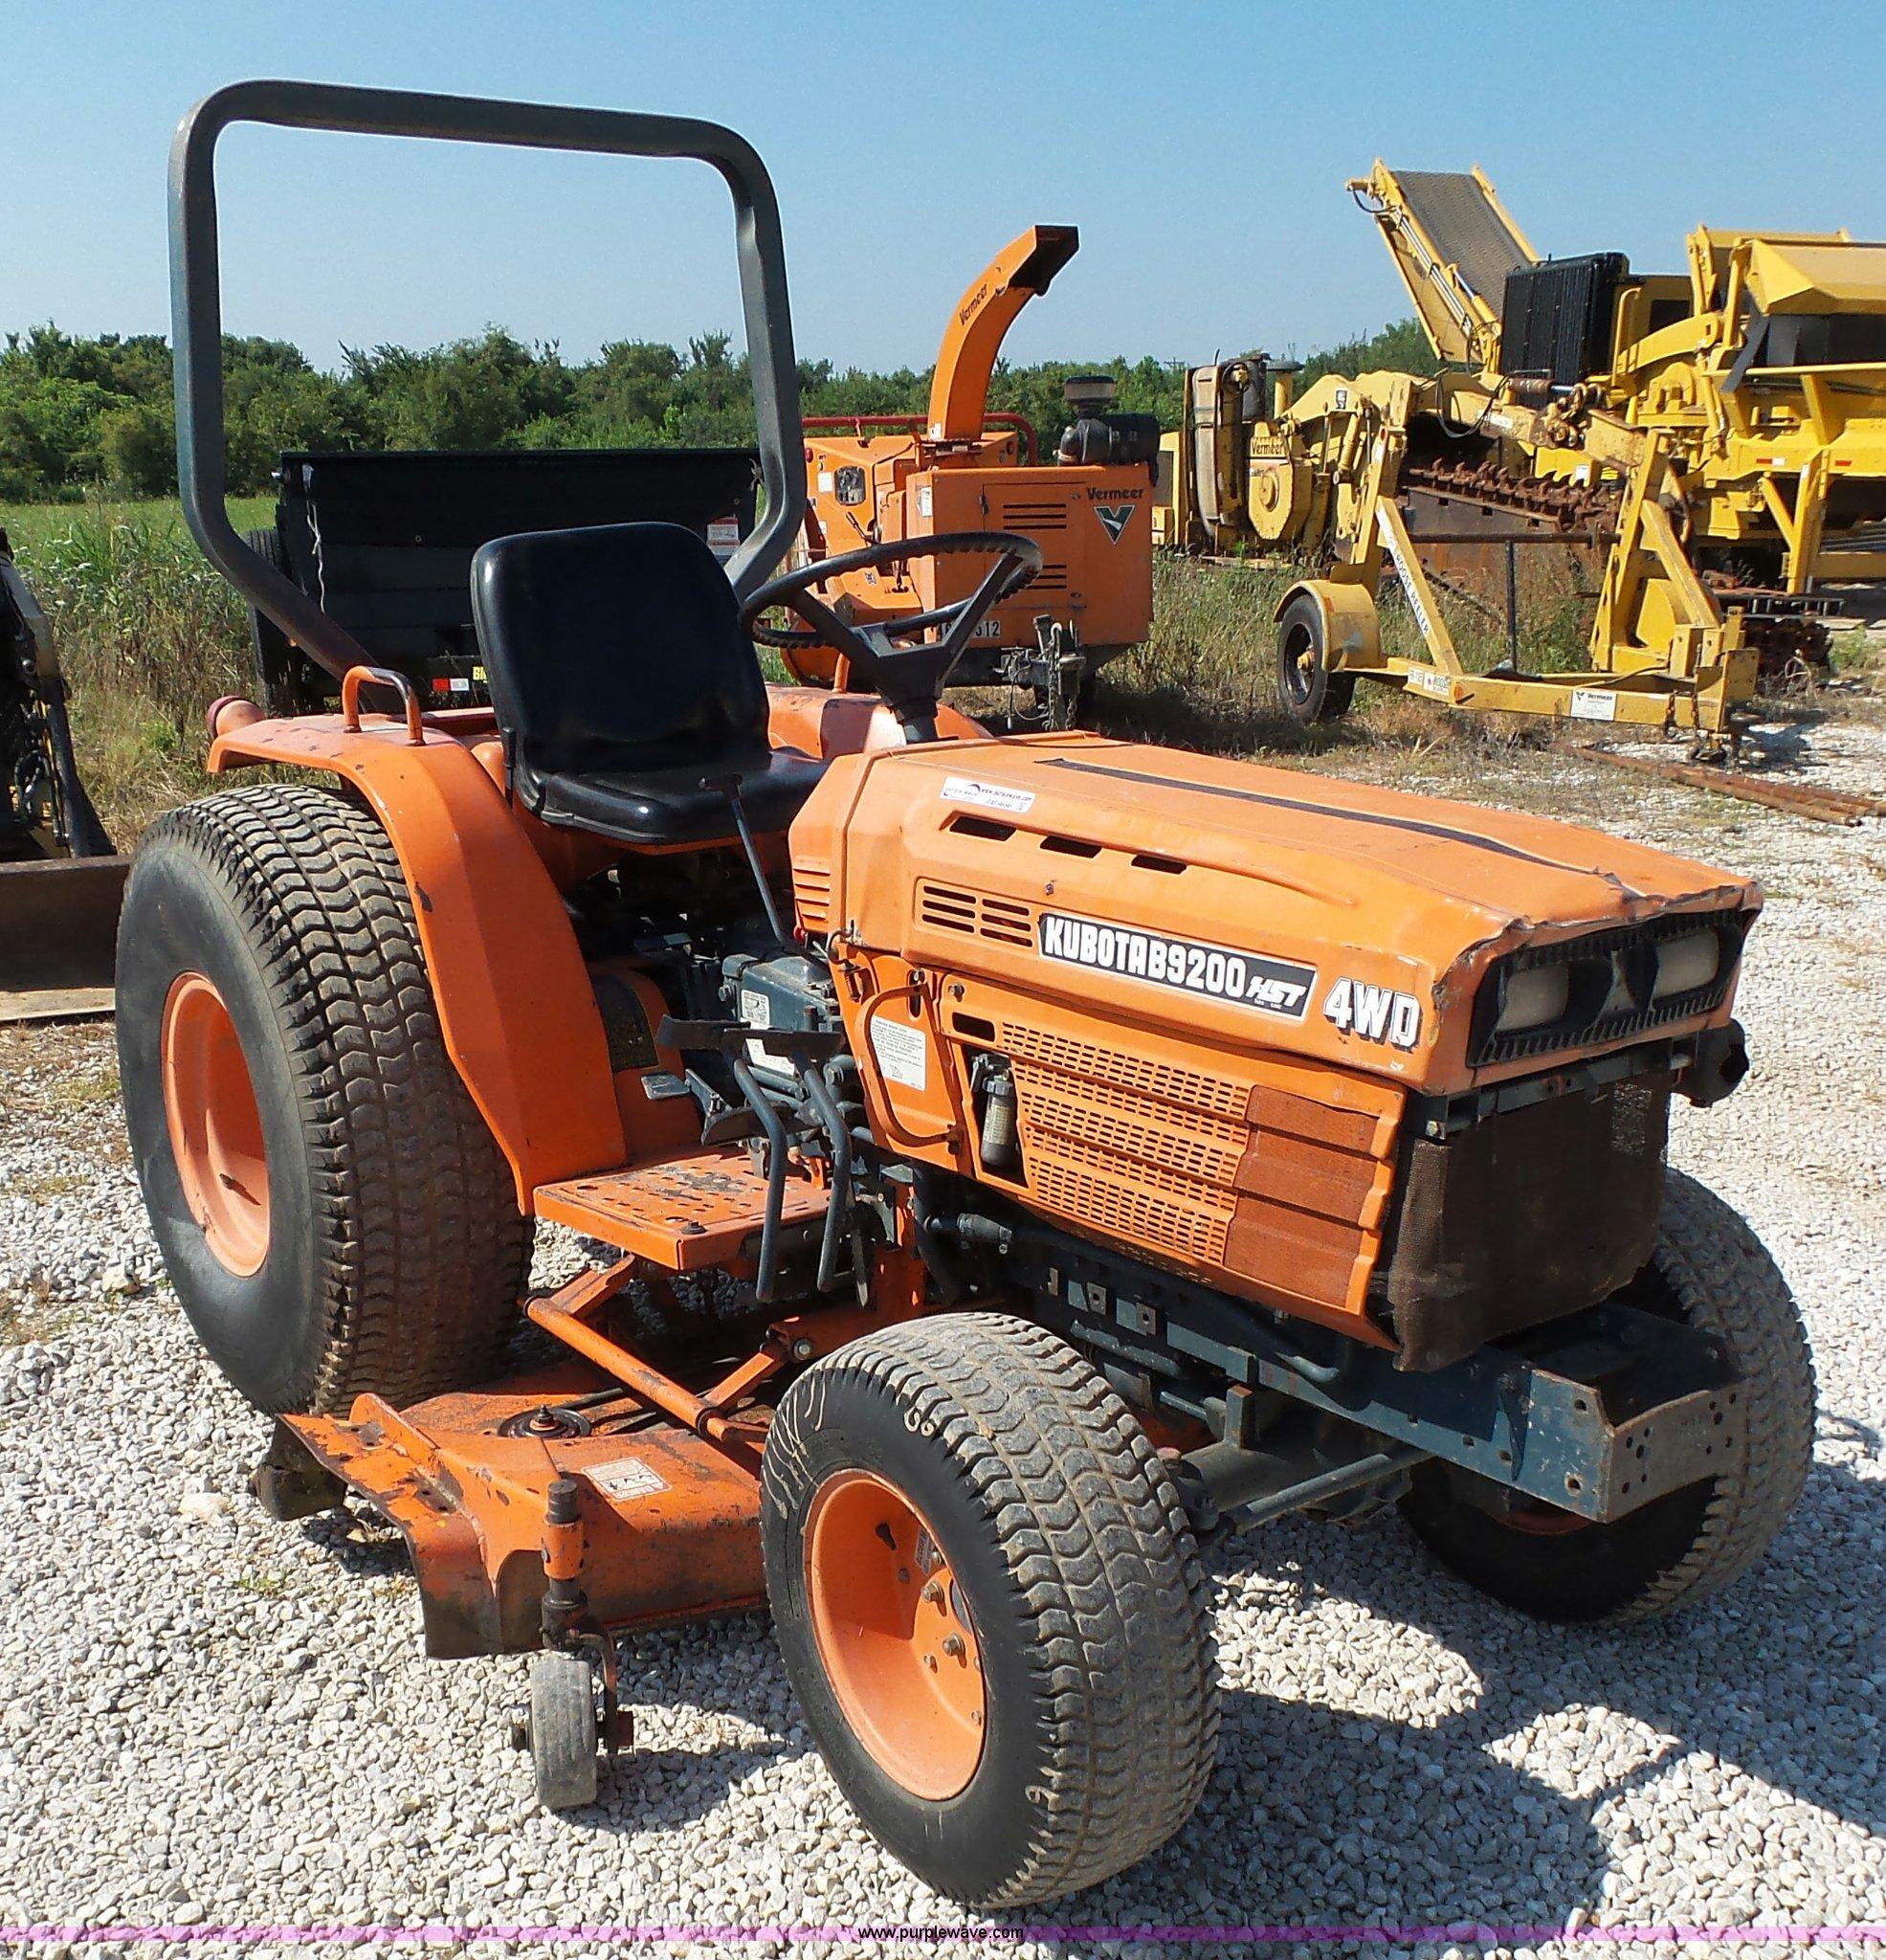 Kubota B9200 MFWD tractor | Item BM9696 | SOLD! August 25 Co